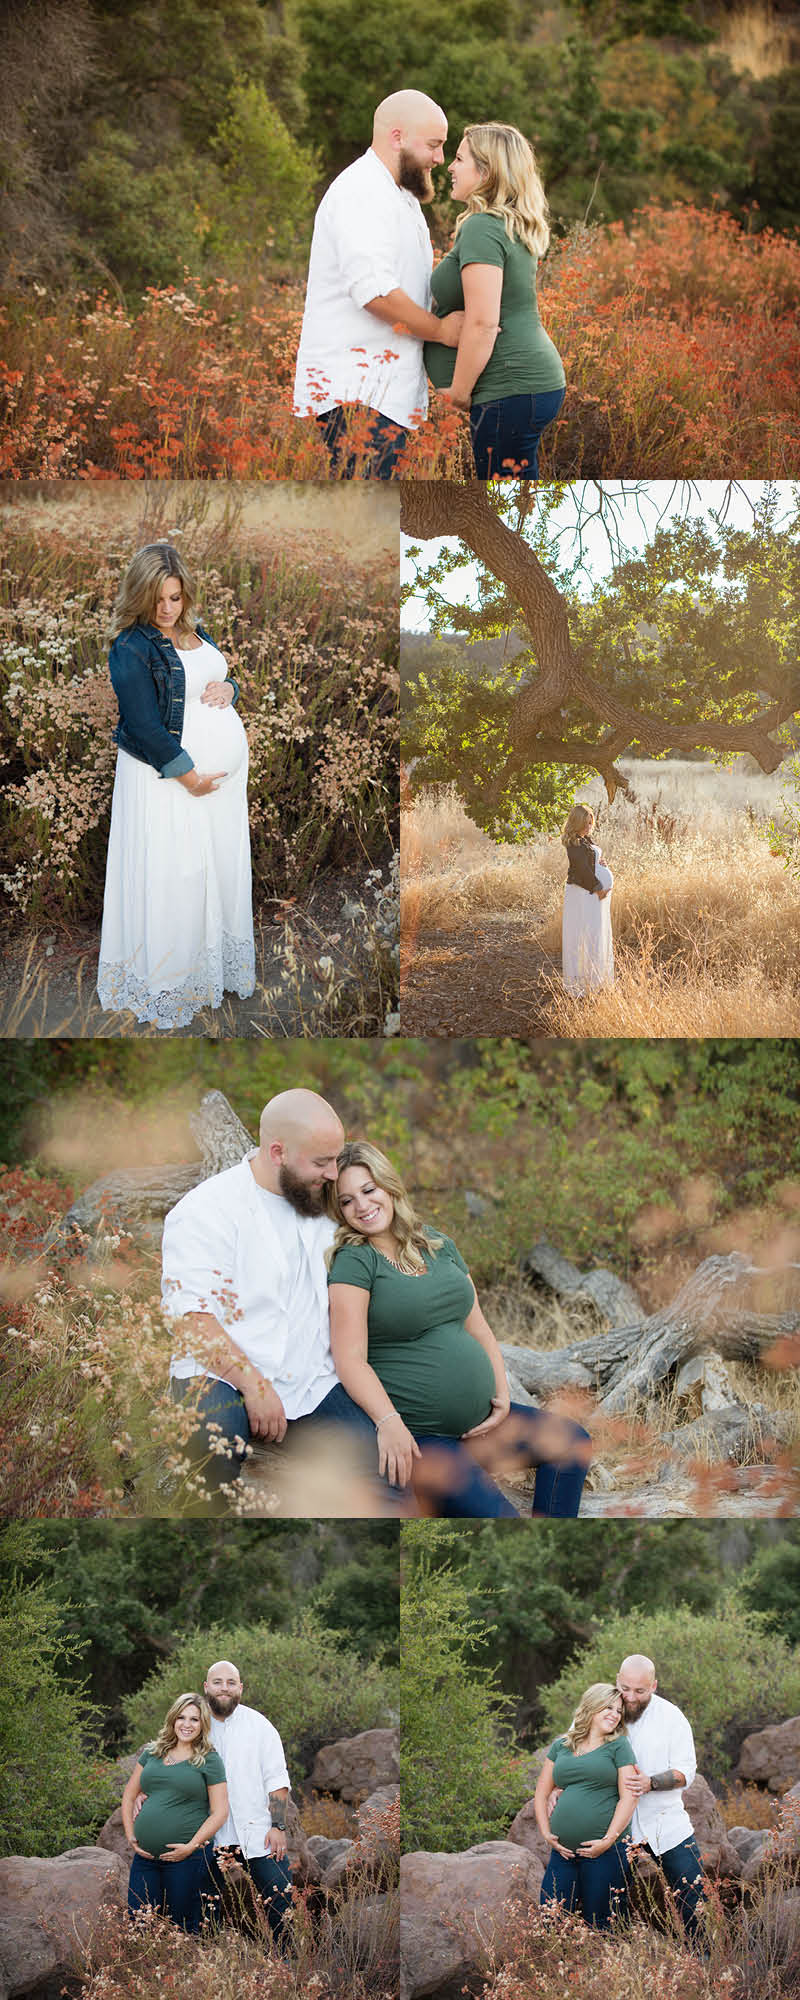 Best maternity photographer in Westlake Village